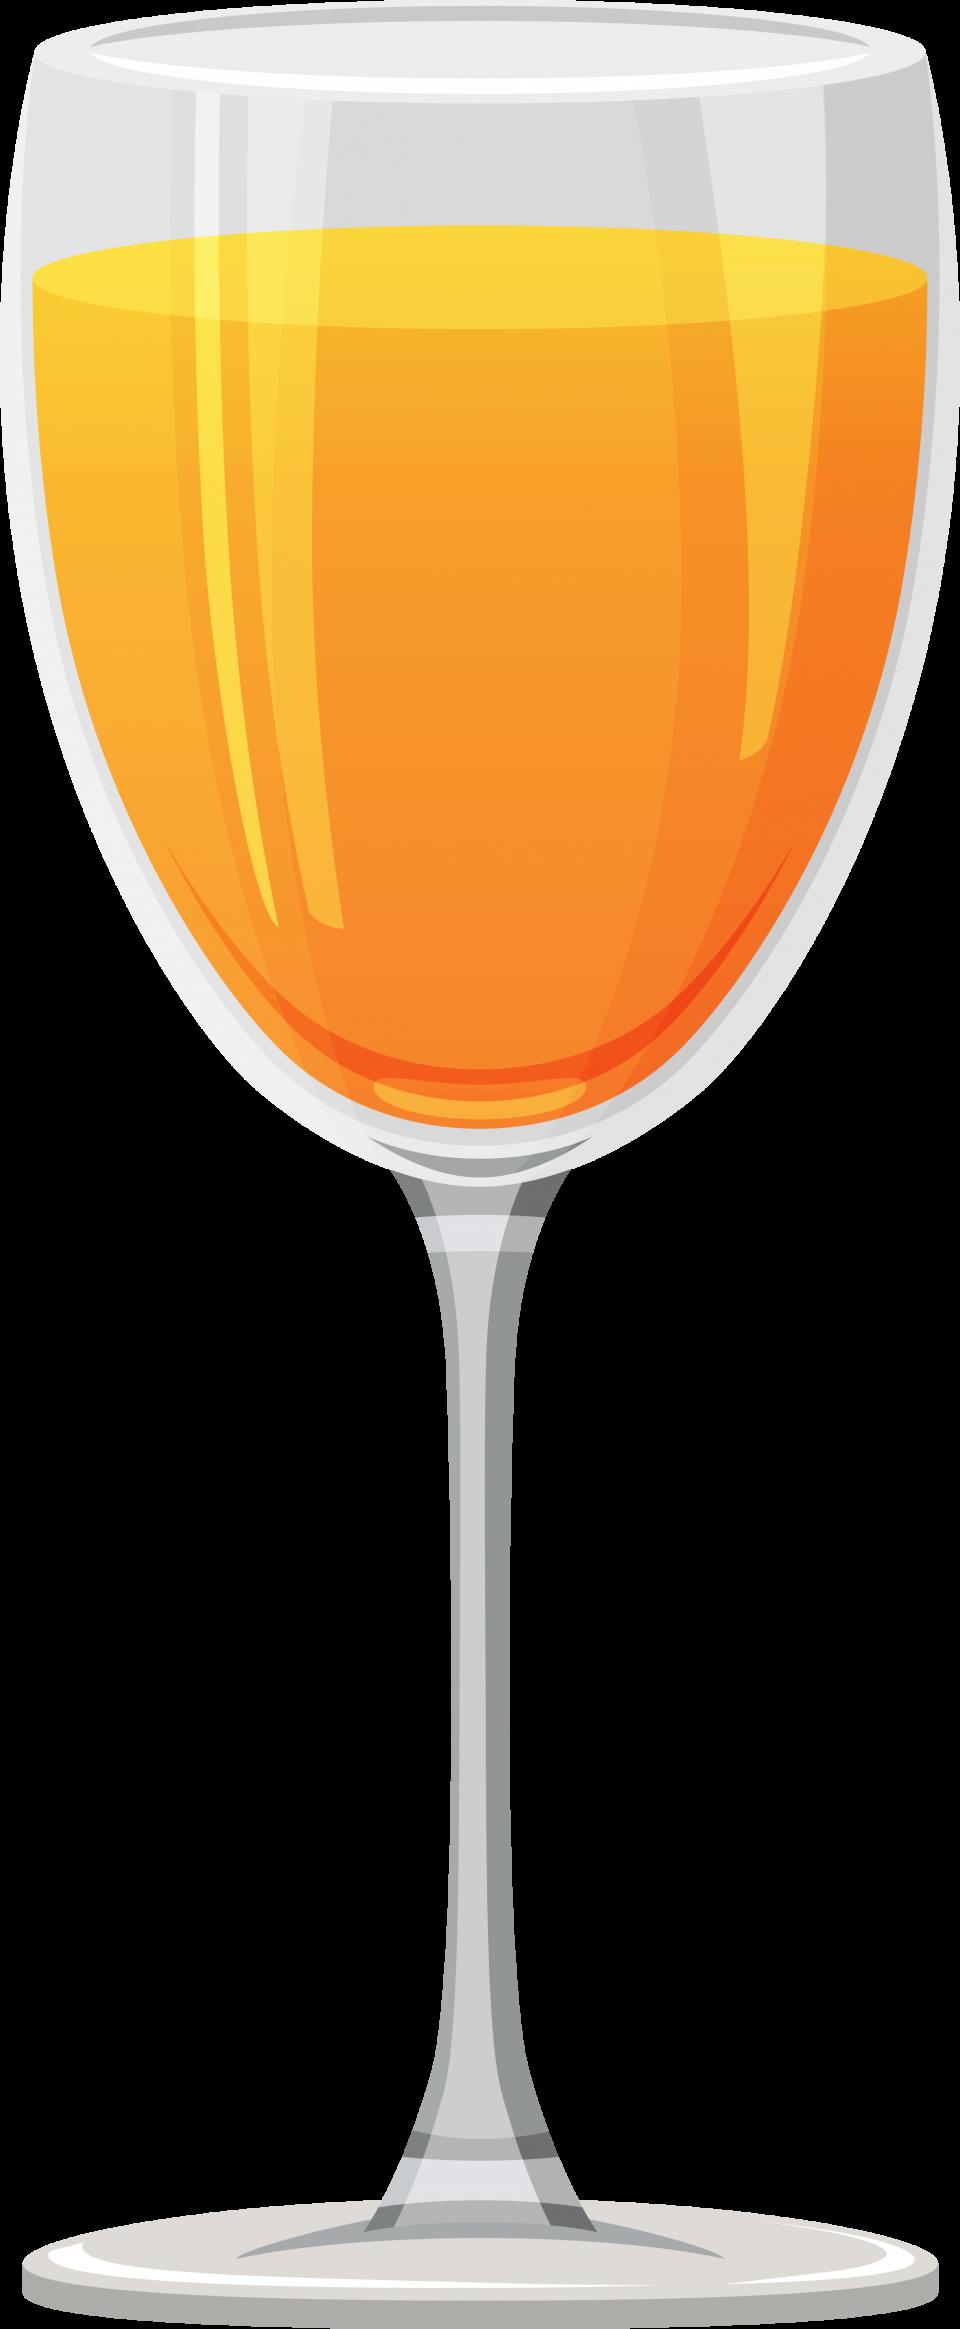 Wine Glass PNG Image - PurePNG   Free transparent CC0 PNG ...